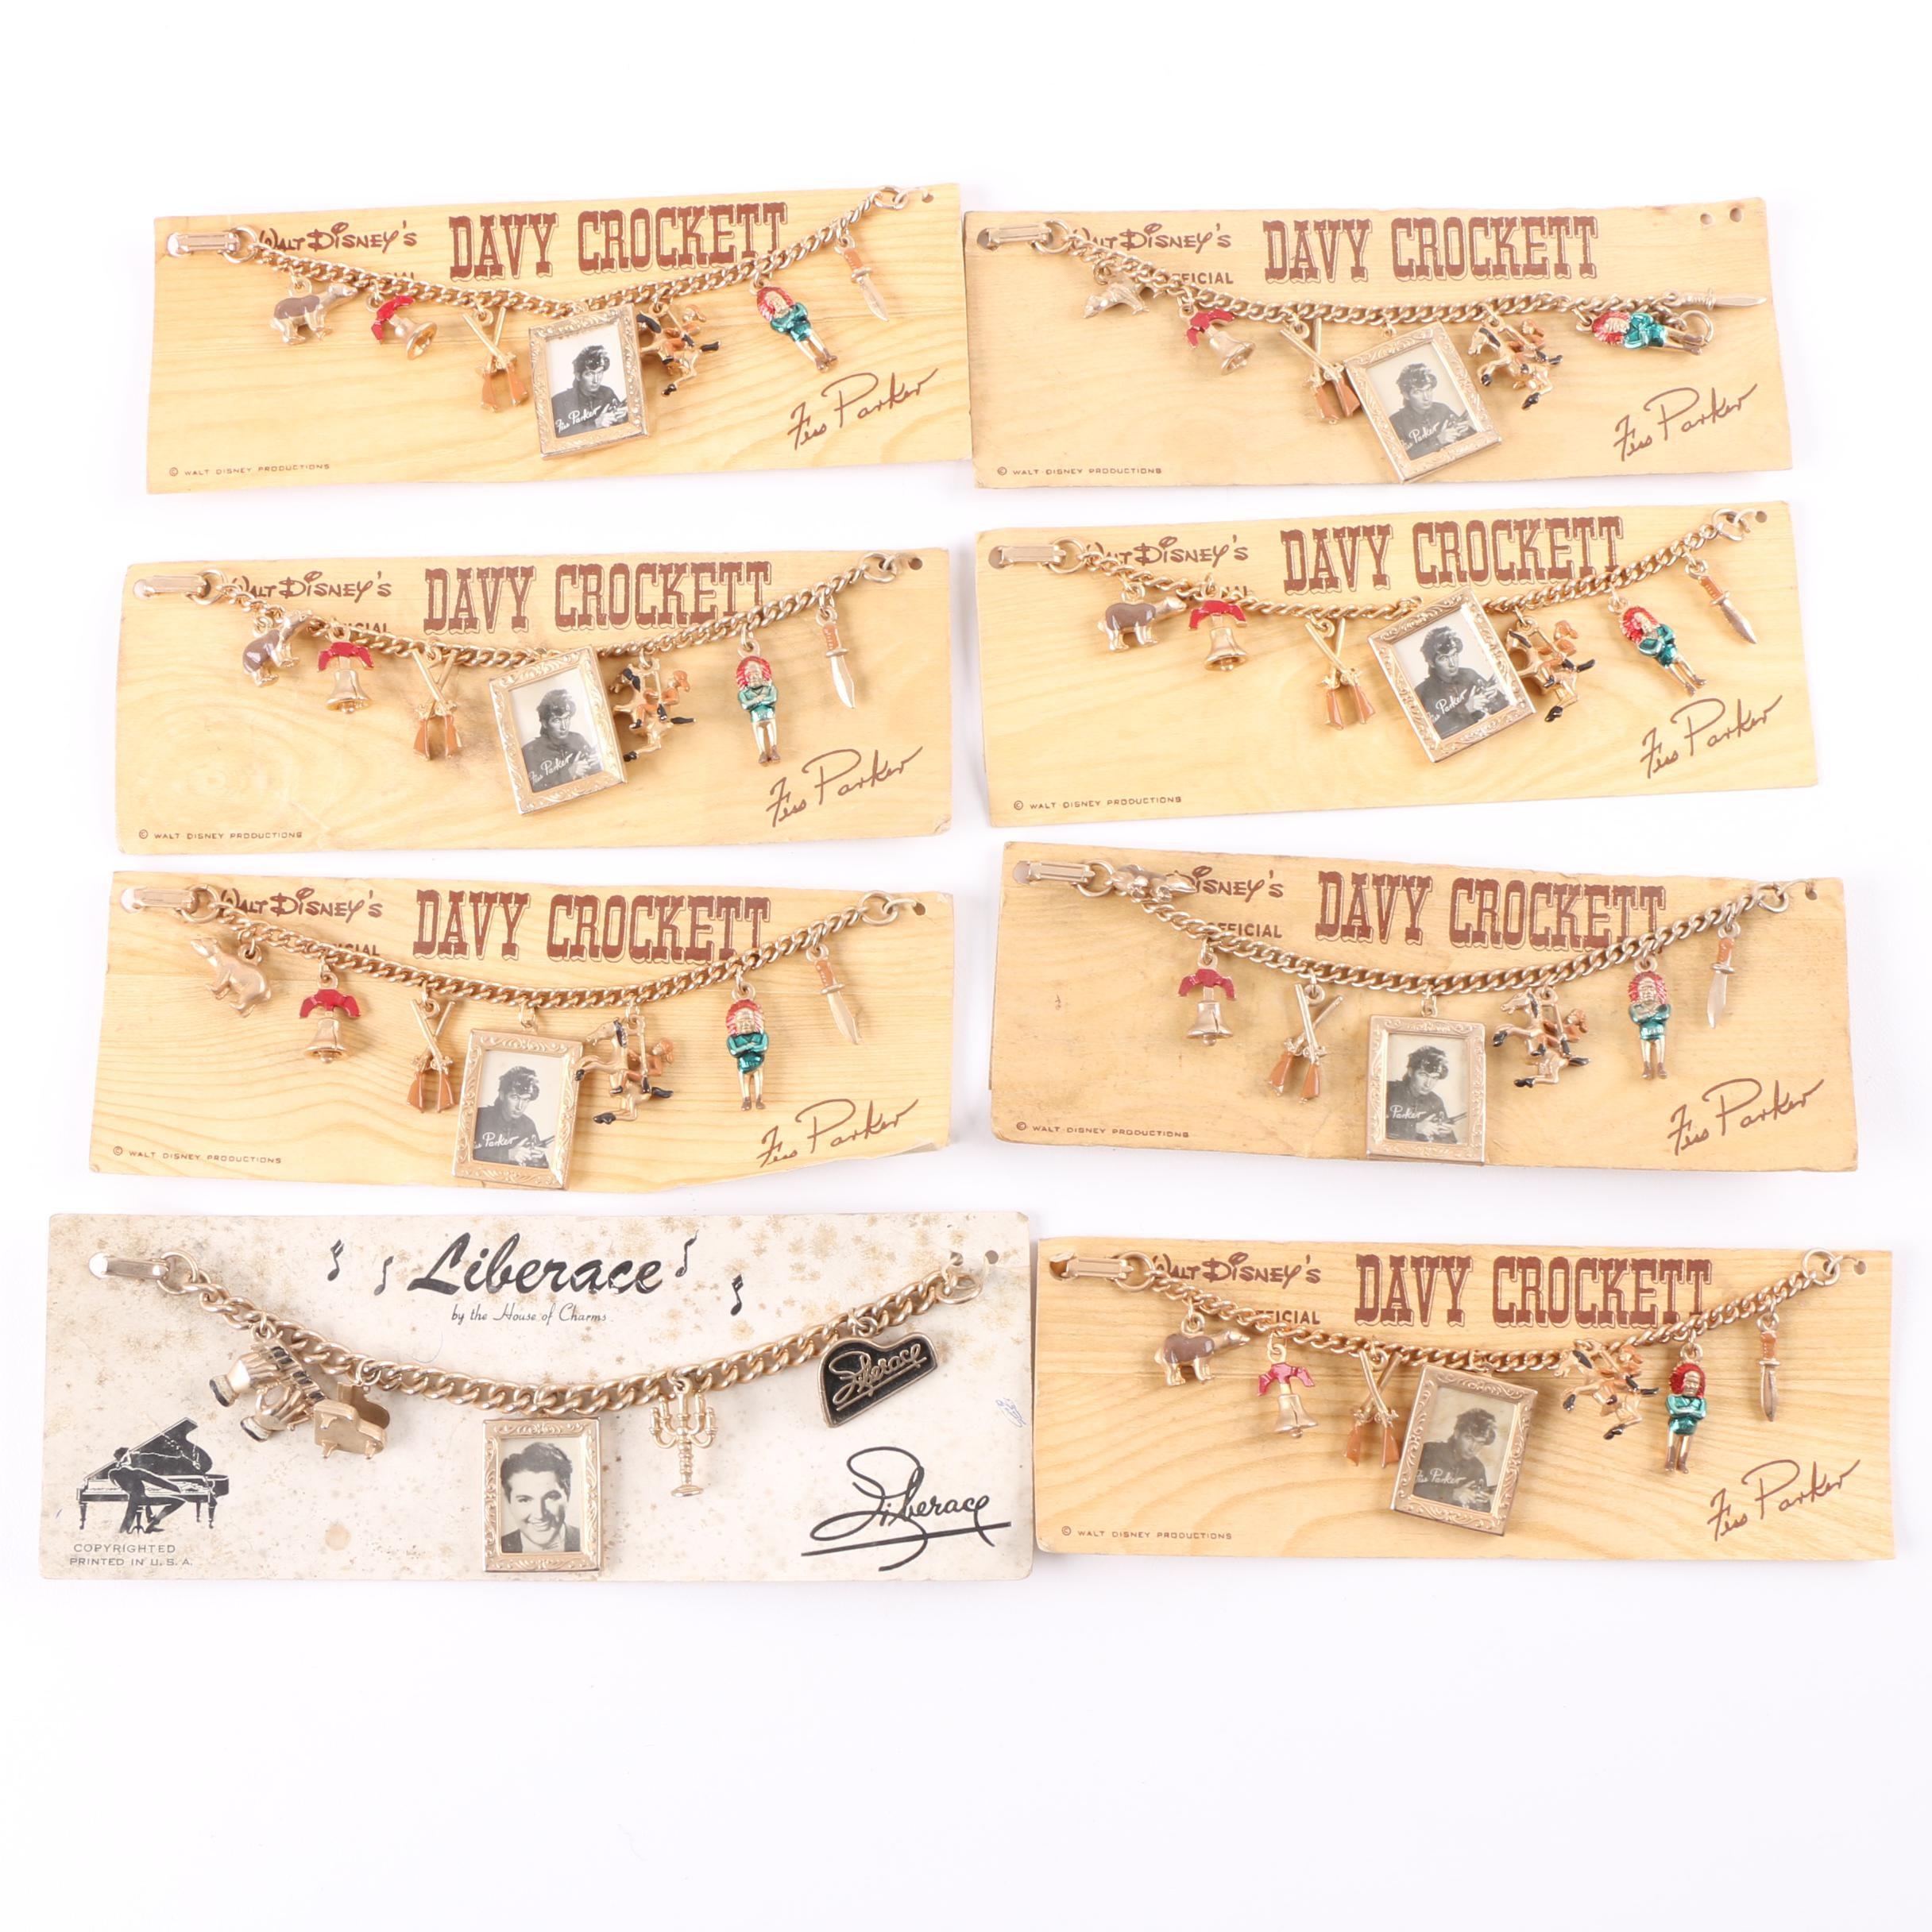 Vintage Collection of Walt Disney's Davy Crockett and Liberace Charm Bracelets